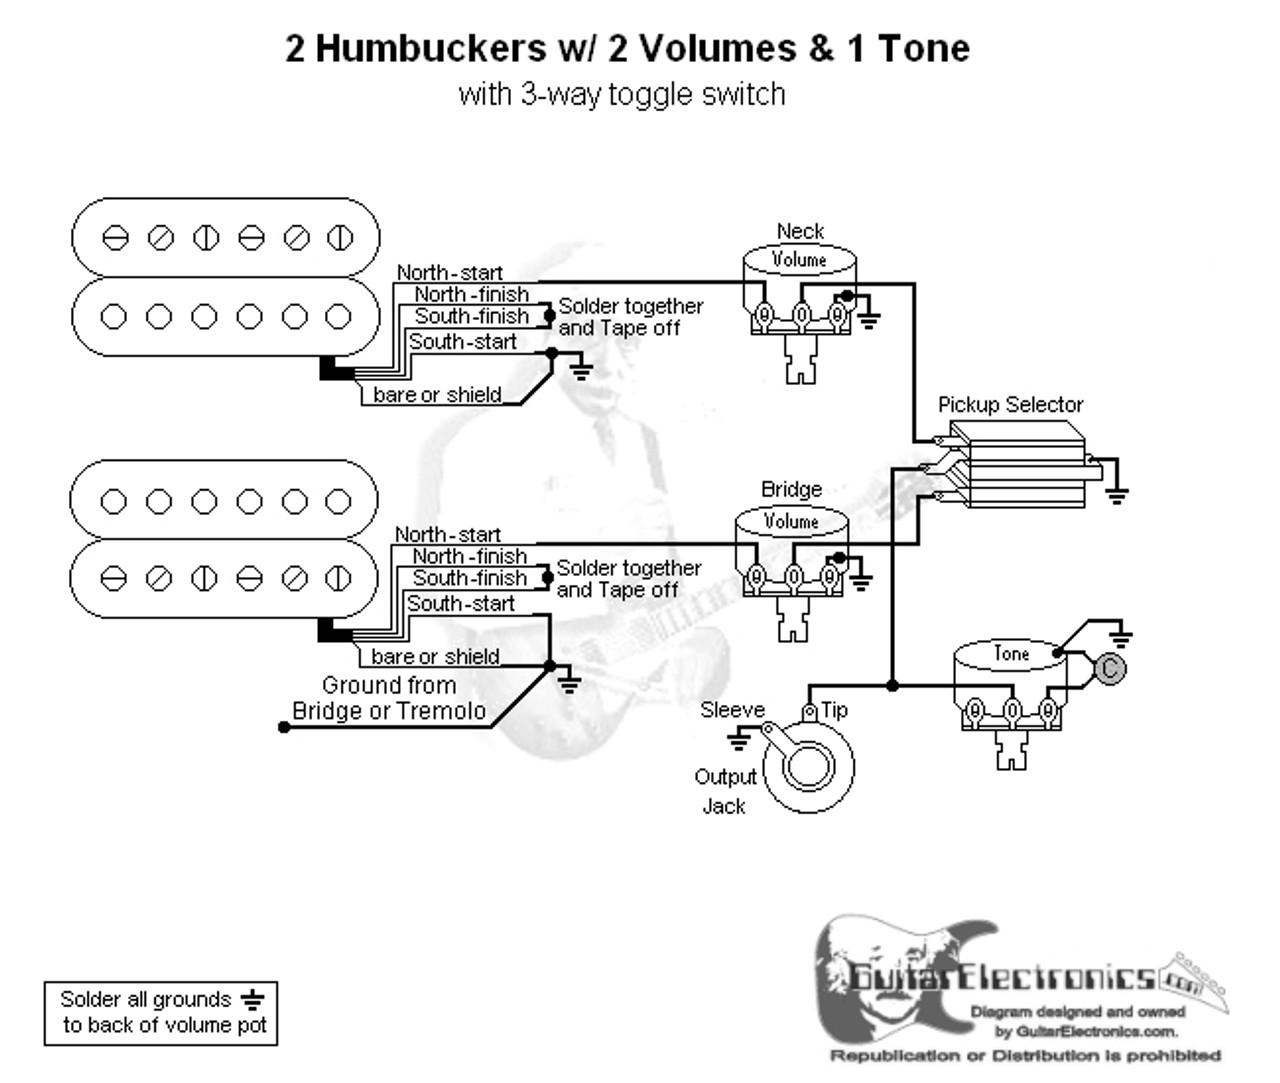 wiring diagram for dean ml 2 tones 1 volume read all wiring diagram 4 Wire Humbucker Wiring-Diagram